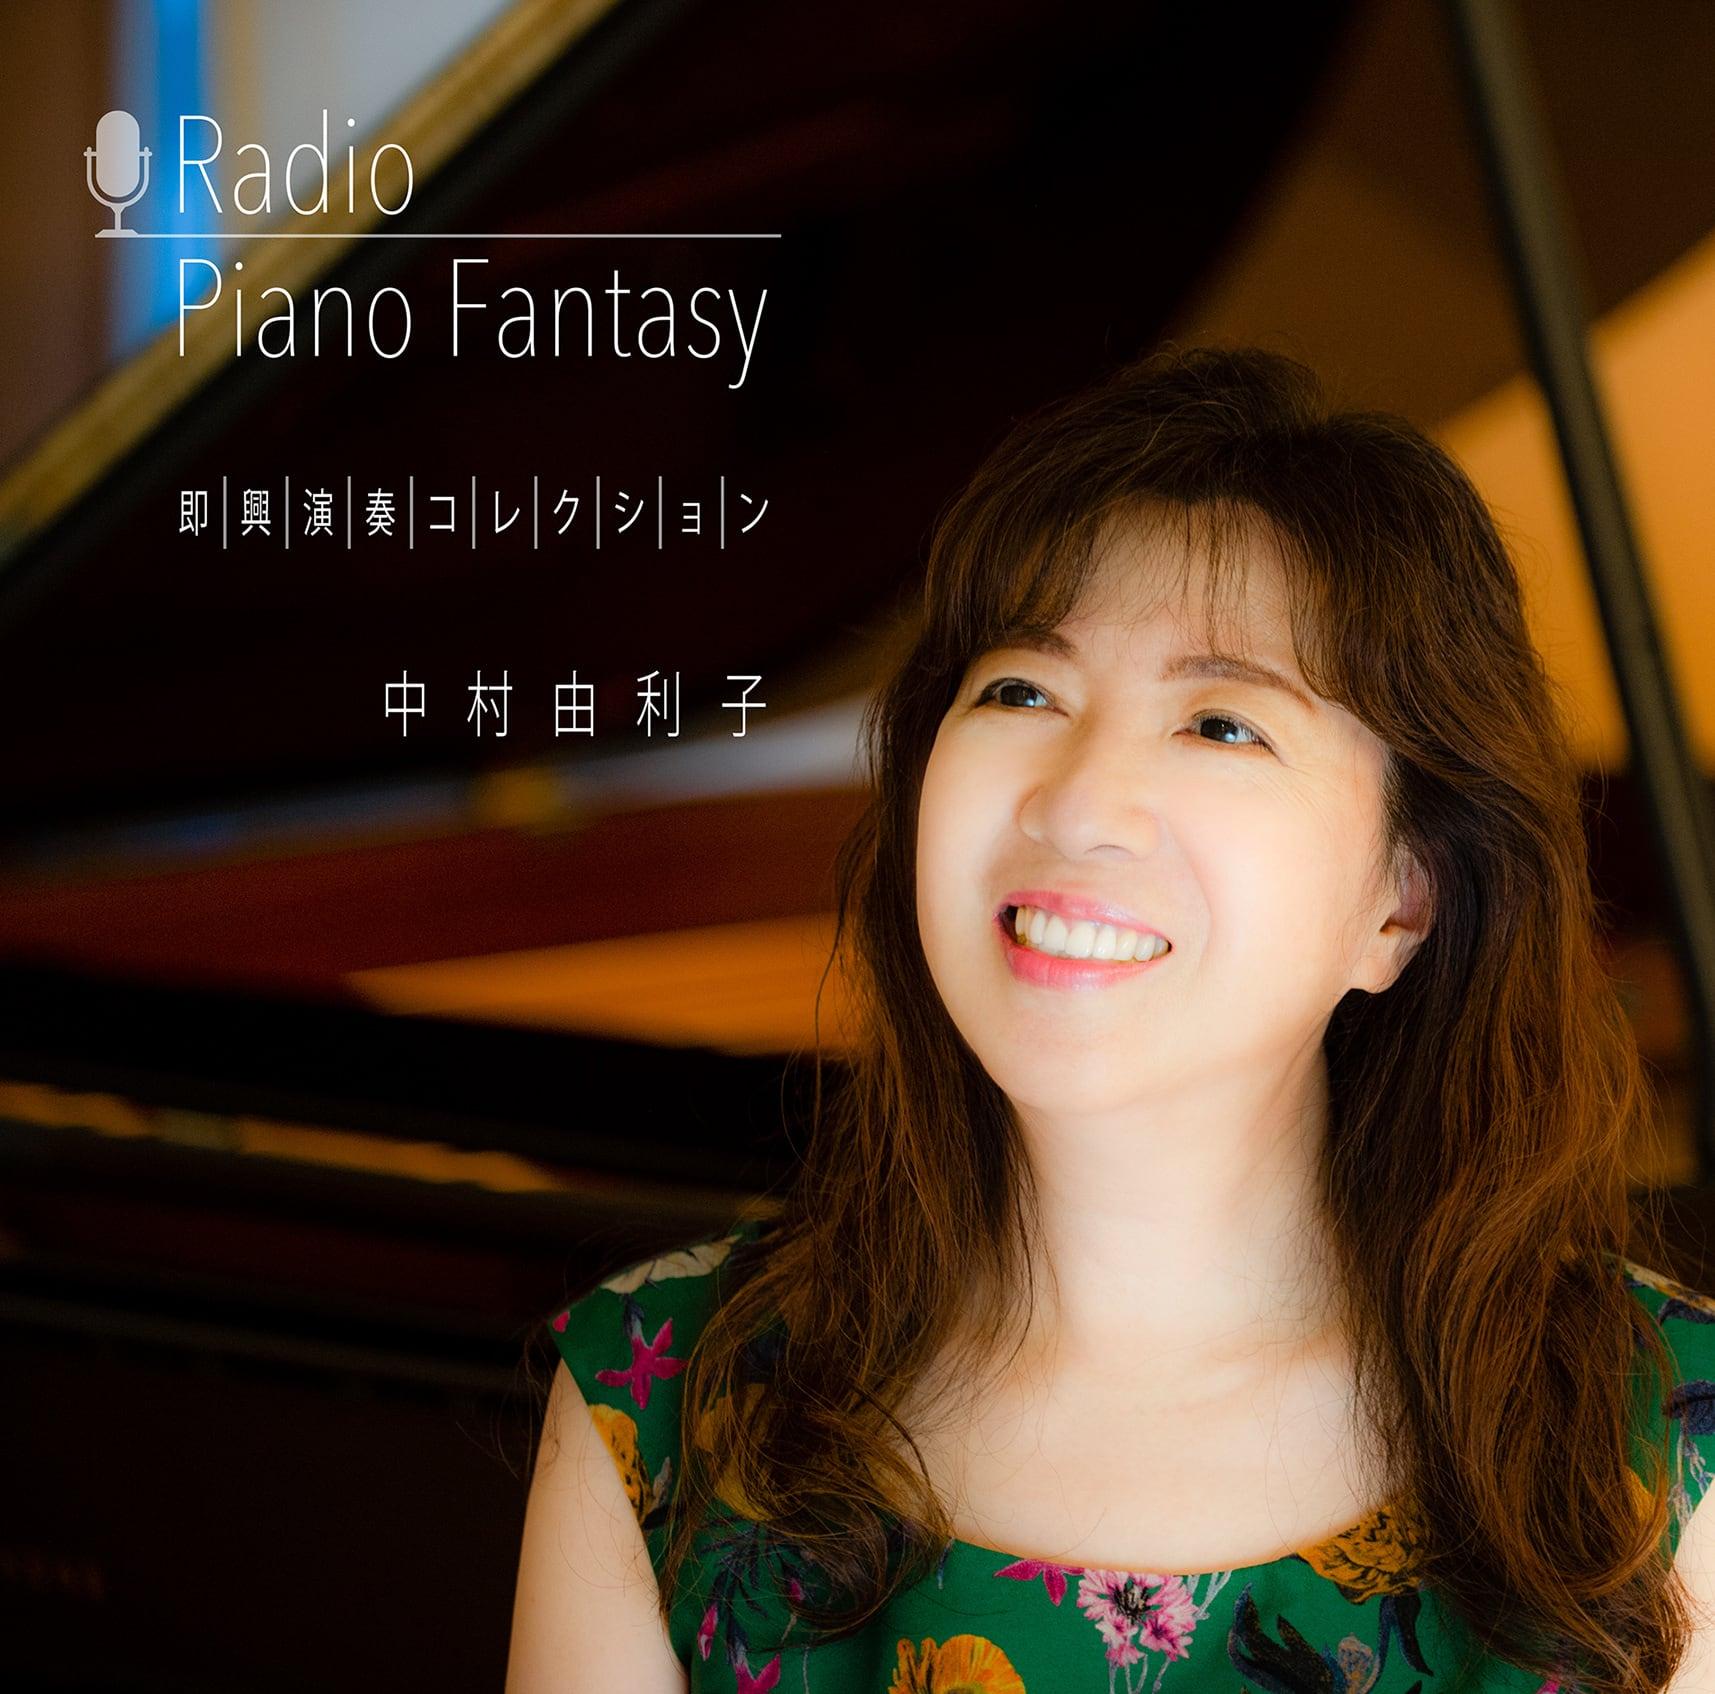 CD 「Radio Piano Fantasy 即興演奏コレクション」